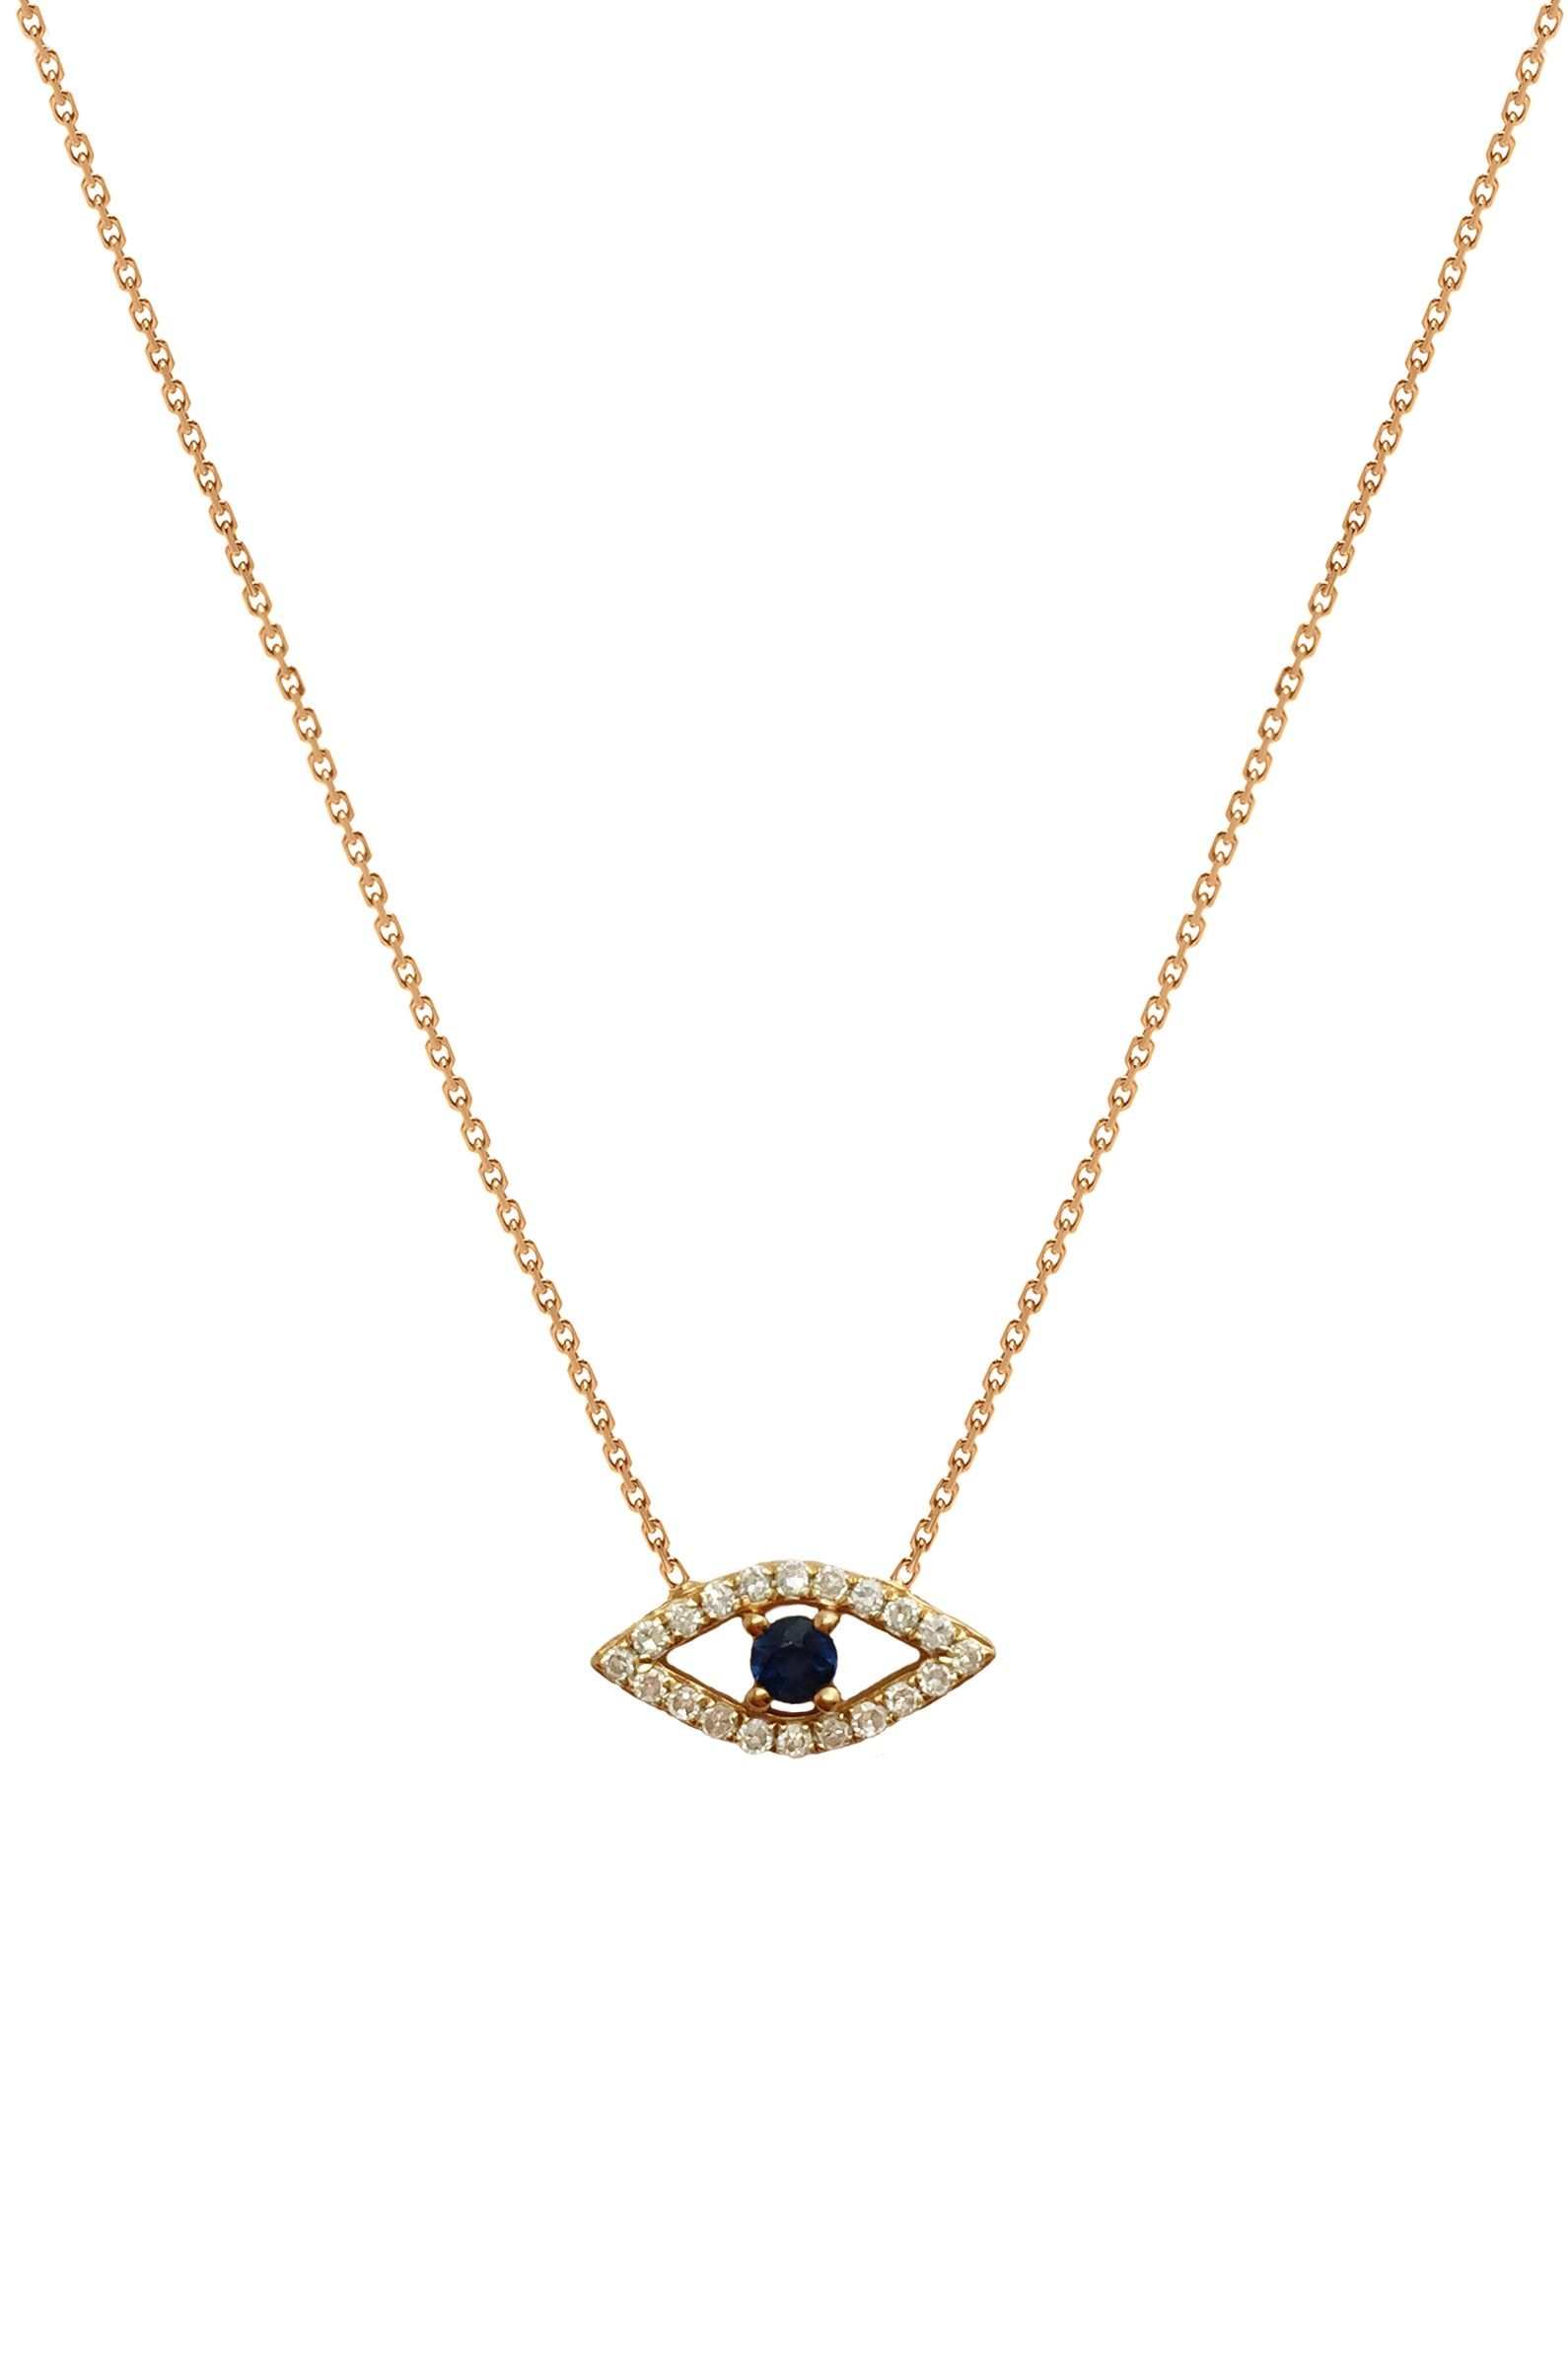 Zoe Lev Jewelry 14k gold diamond evil eye pendant